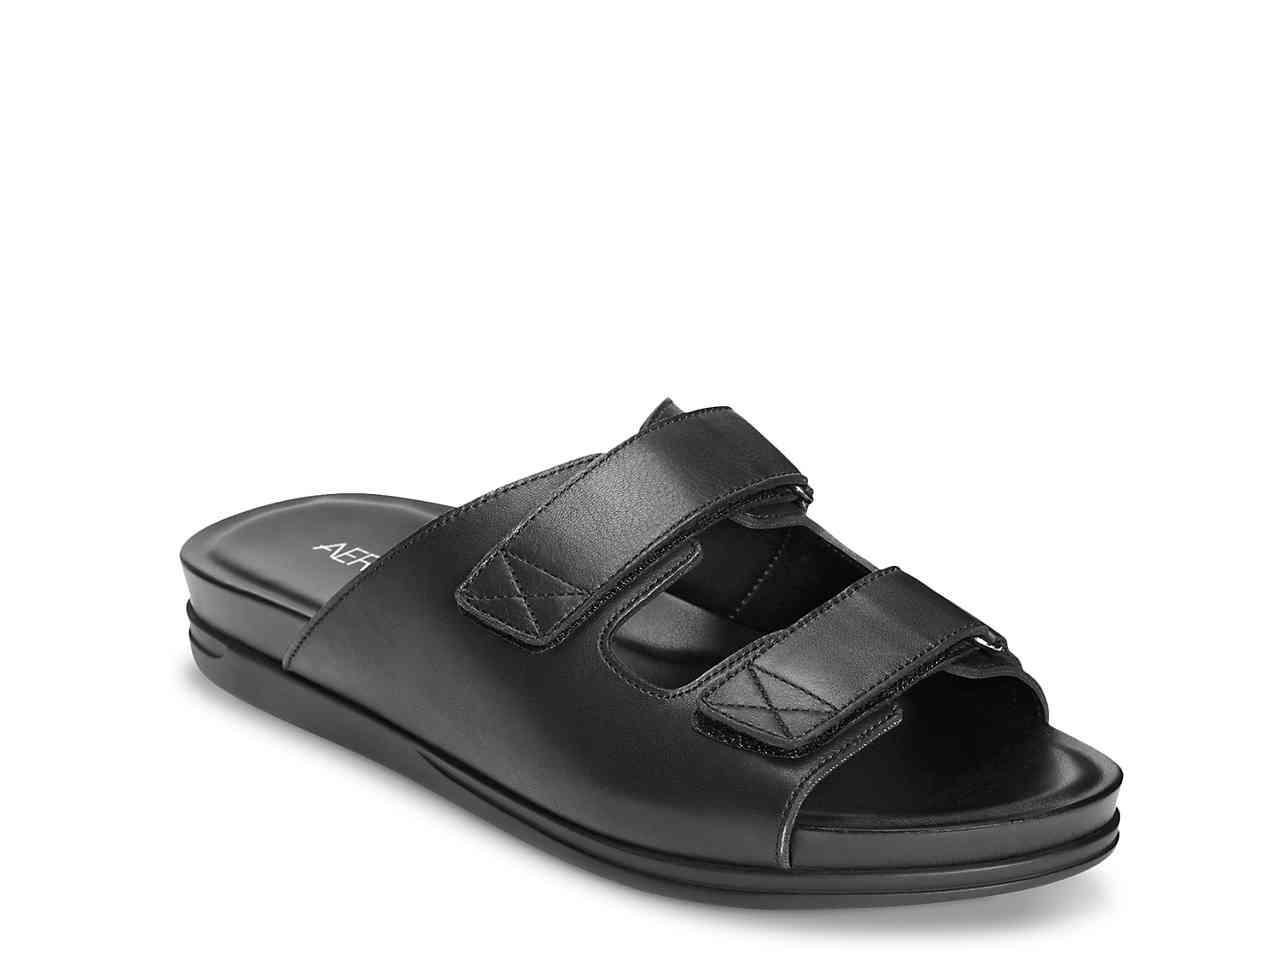 b3321fffff Lyst - Aerosoles Happy Hour Sandal in Black